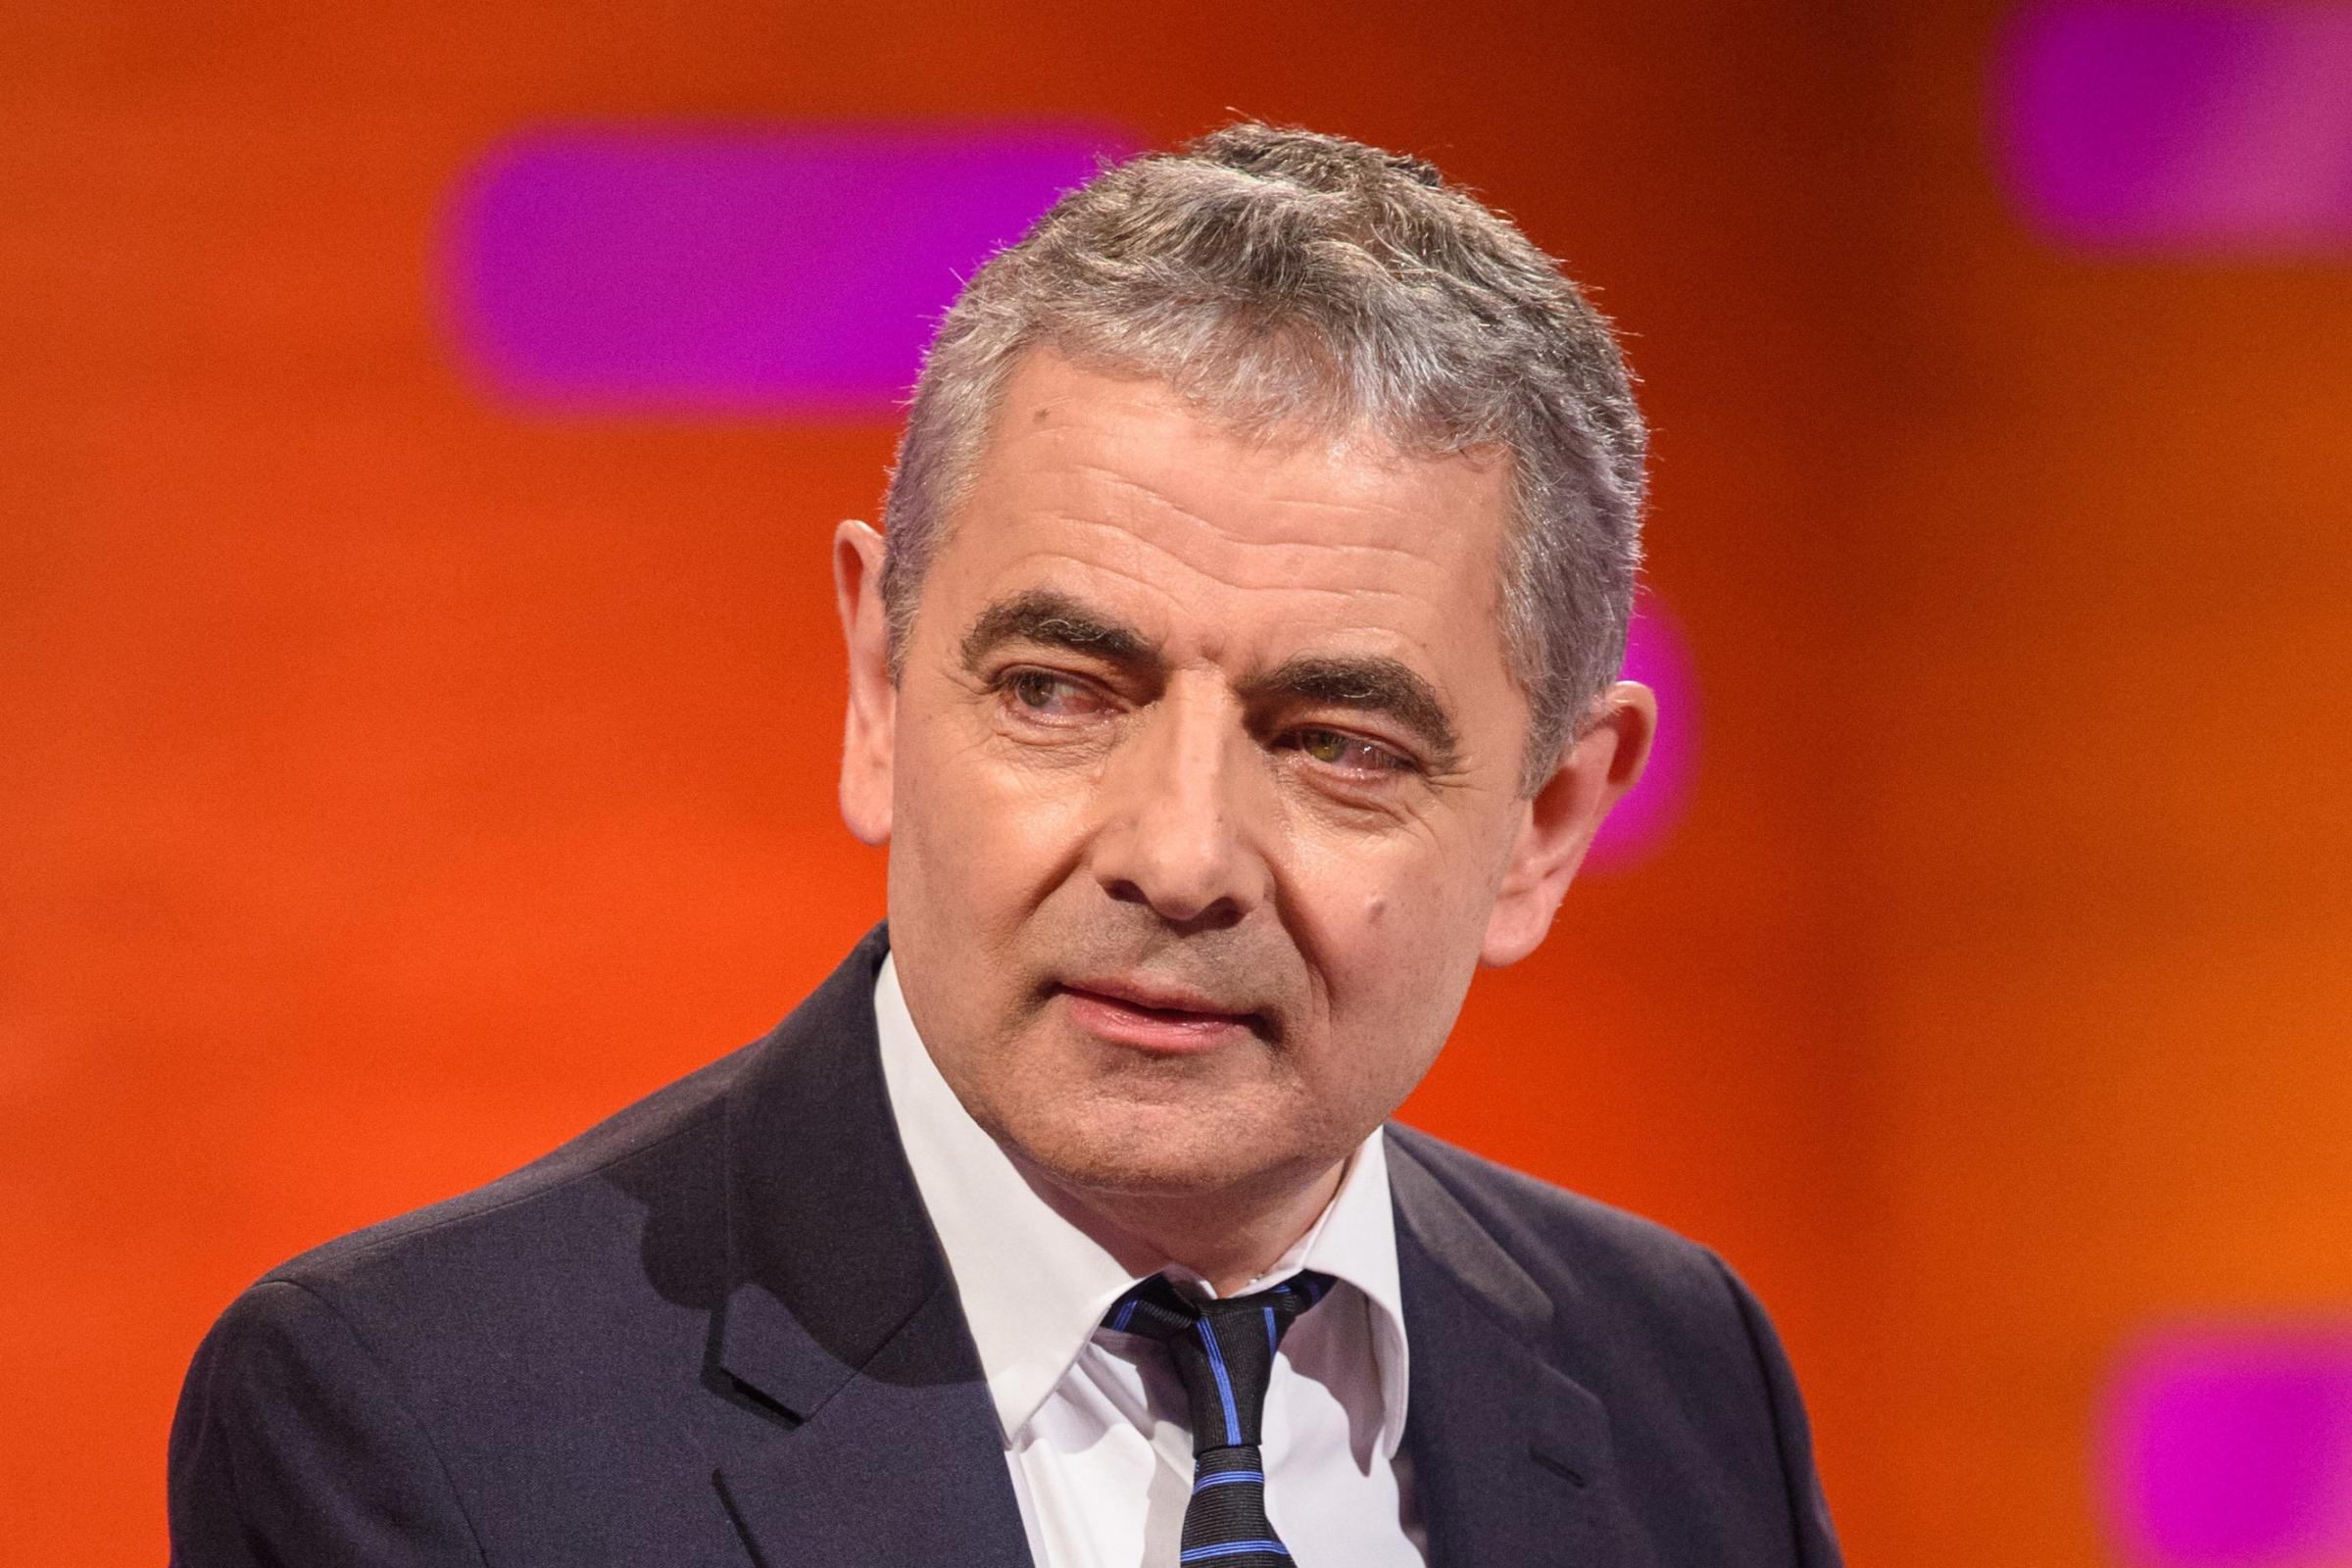 Rowan Atkinson to play three vicars in new Radio 4 comedy